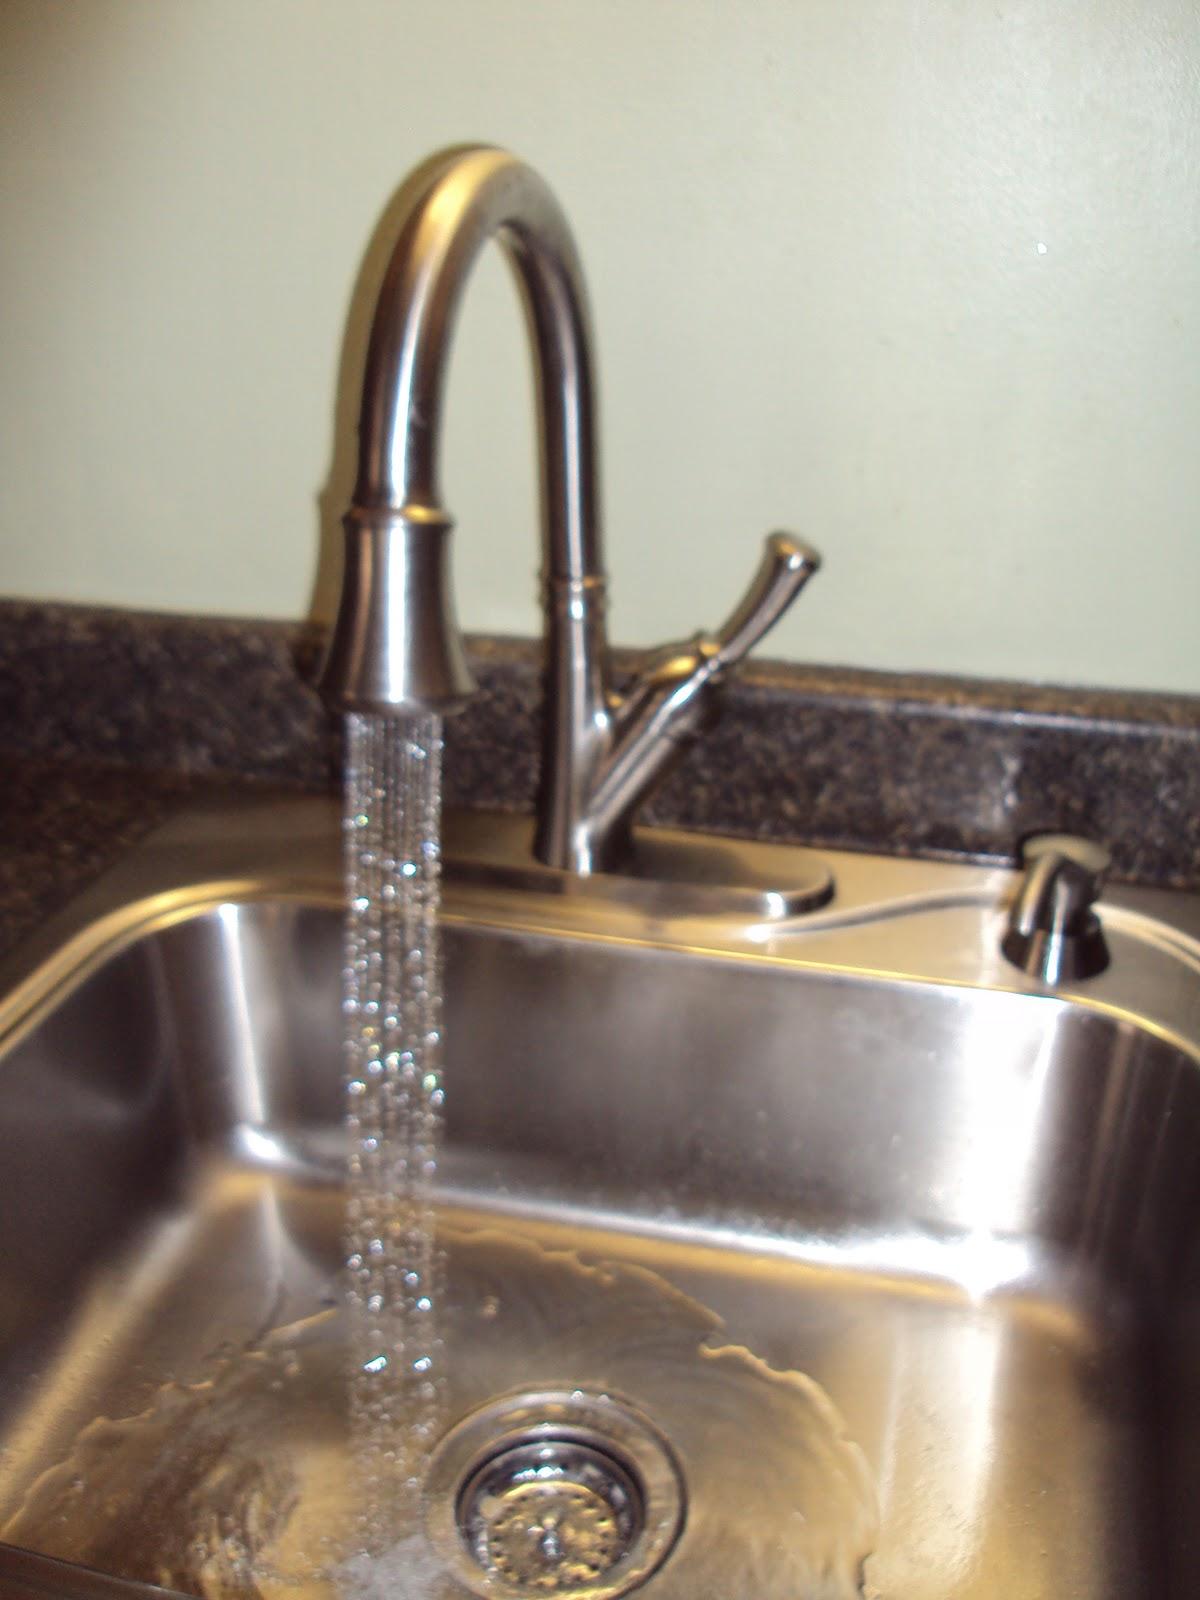 Sevile Single Handle Pull-Down Delta Faucet Review - Momma D and Da Boyz